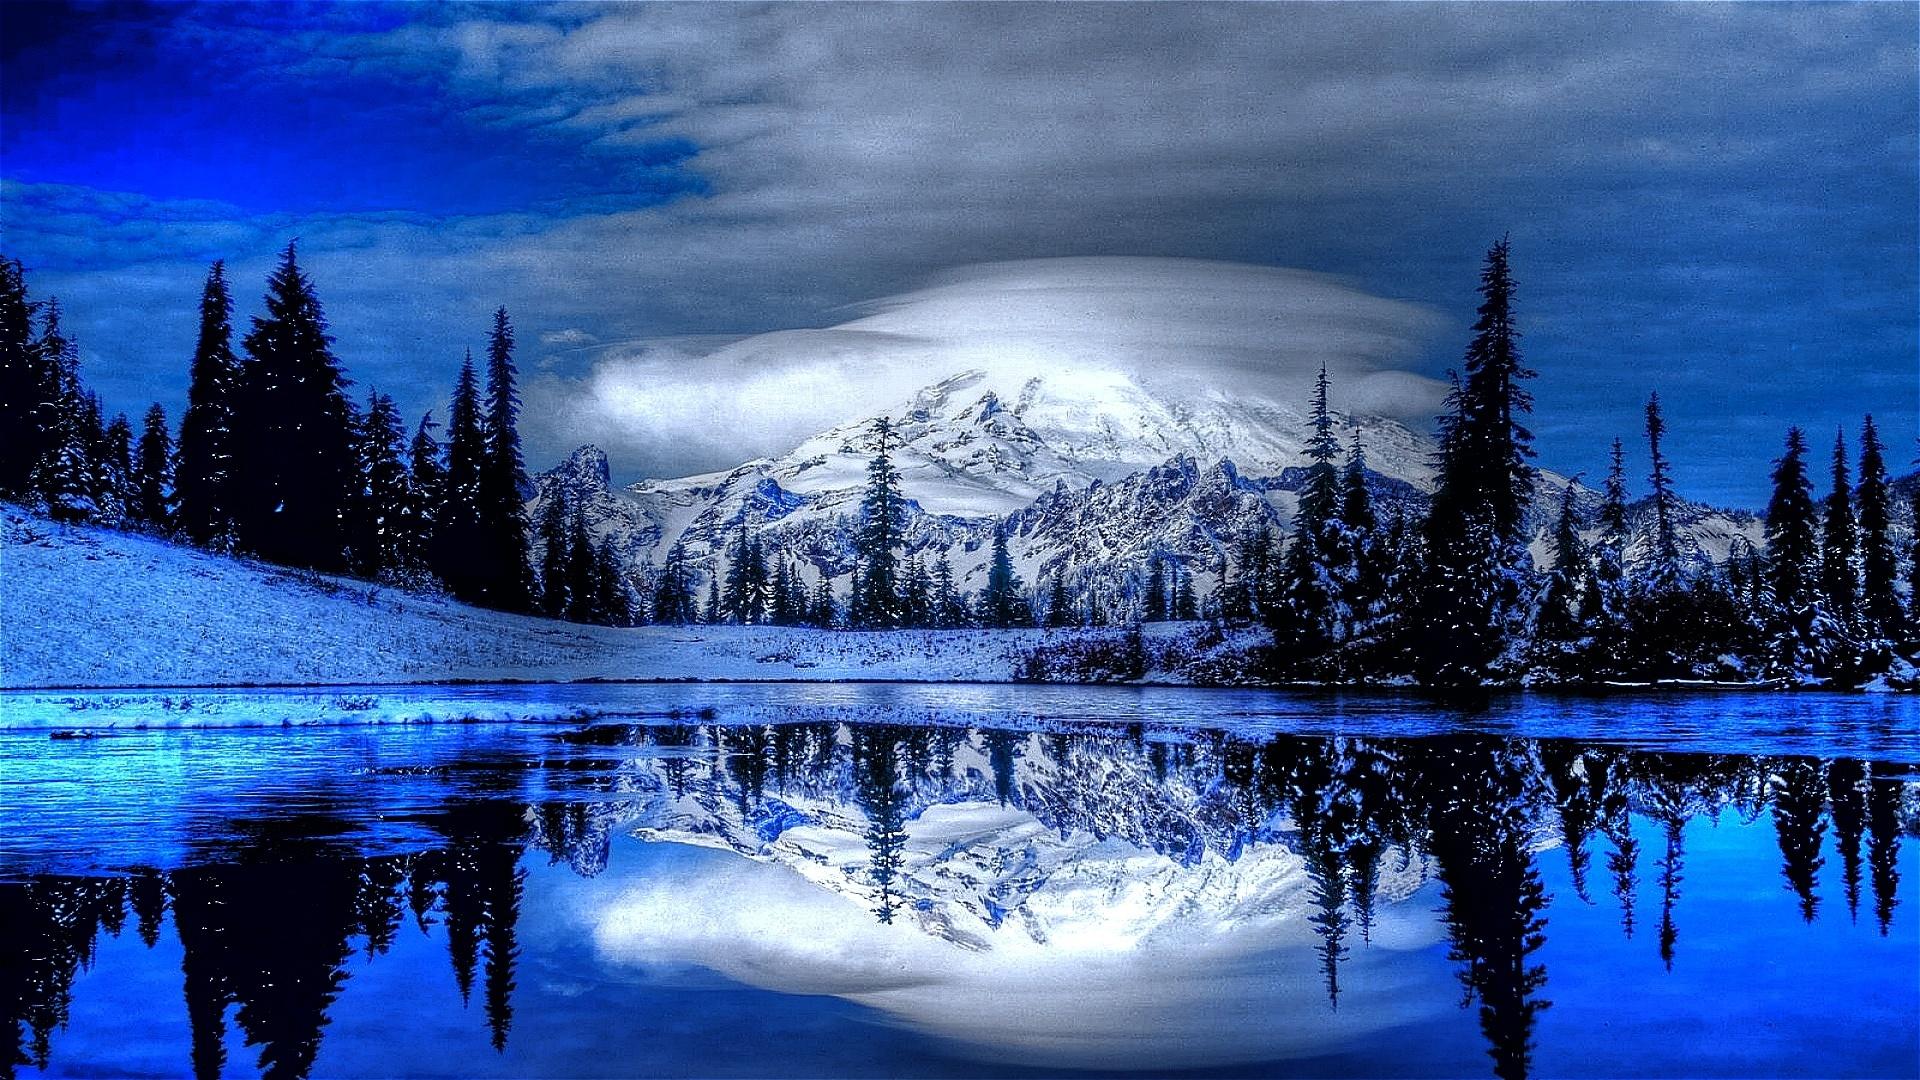 tumblr live wallpaper,sky,nature,natural landscape,reflection,blue